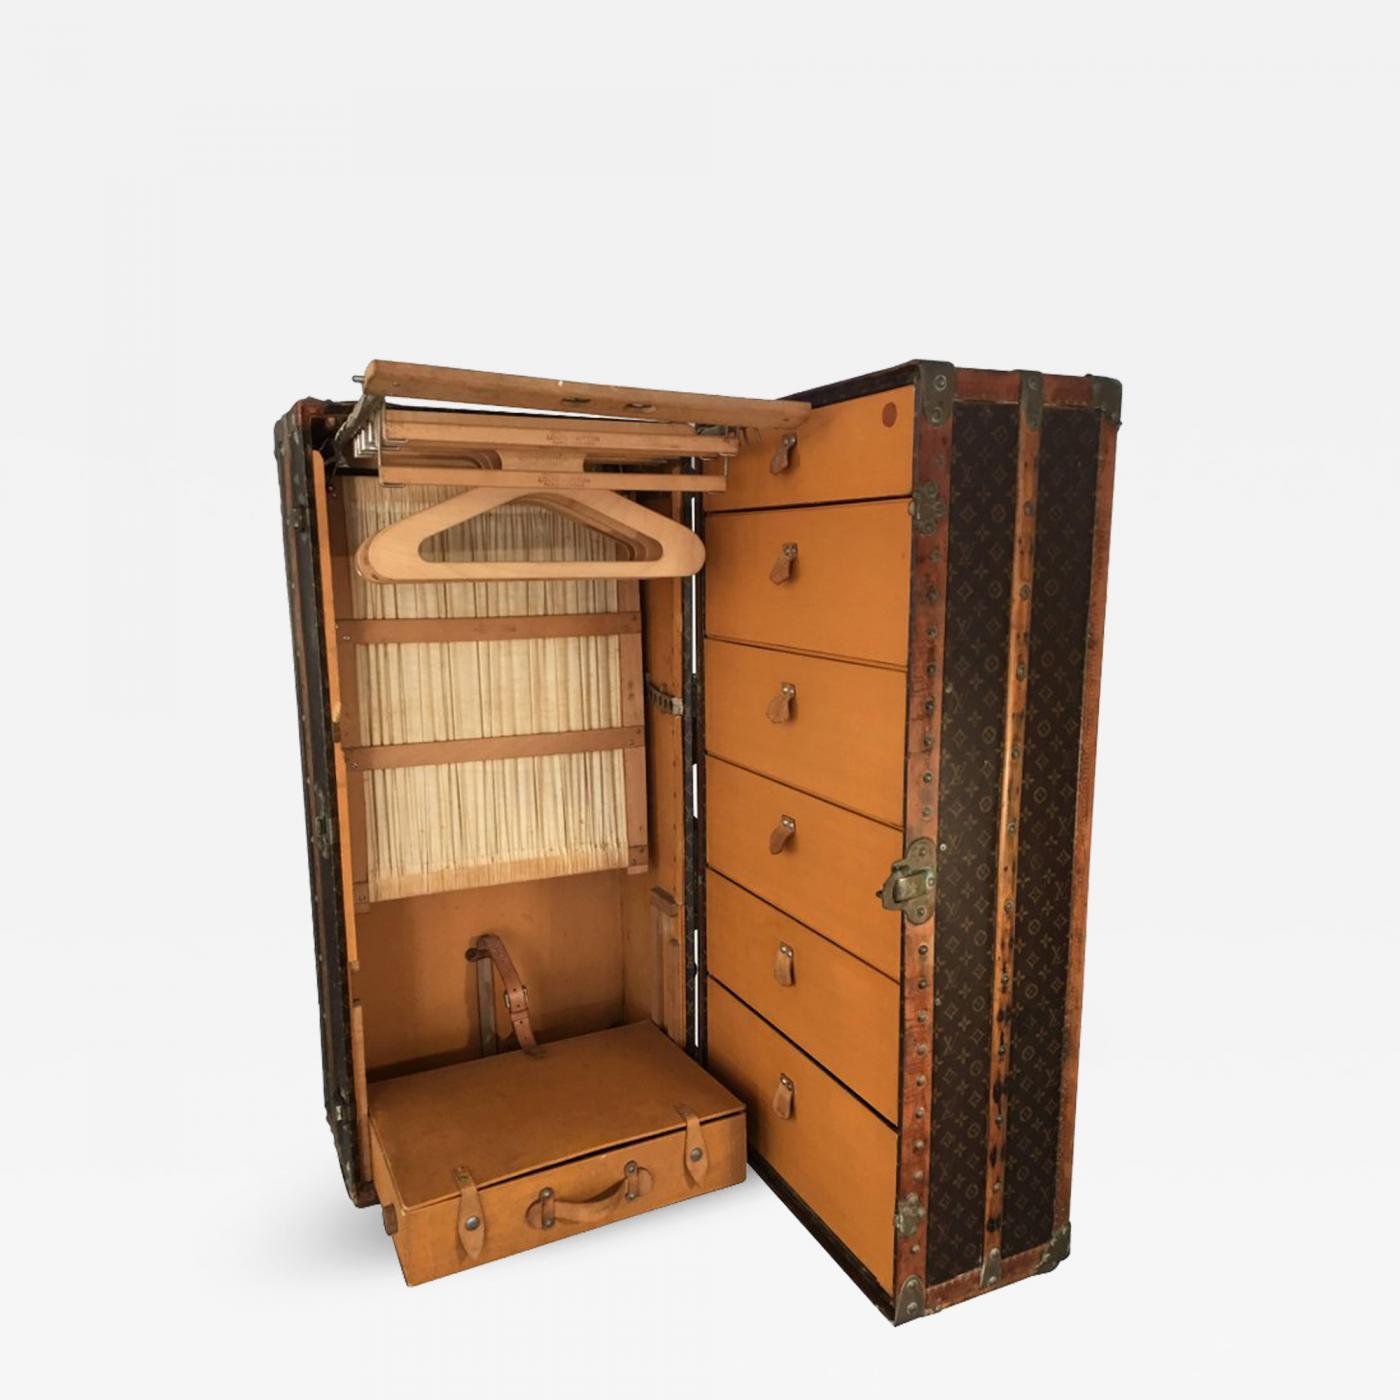 6fd538880438 Louis Vuitton - Louis Vuitton Wardrobe Trunk